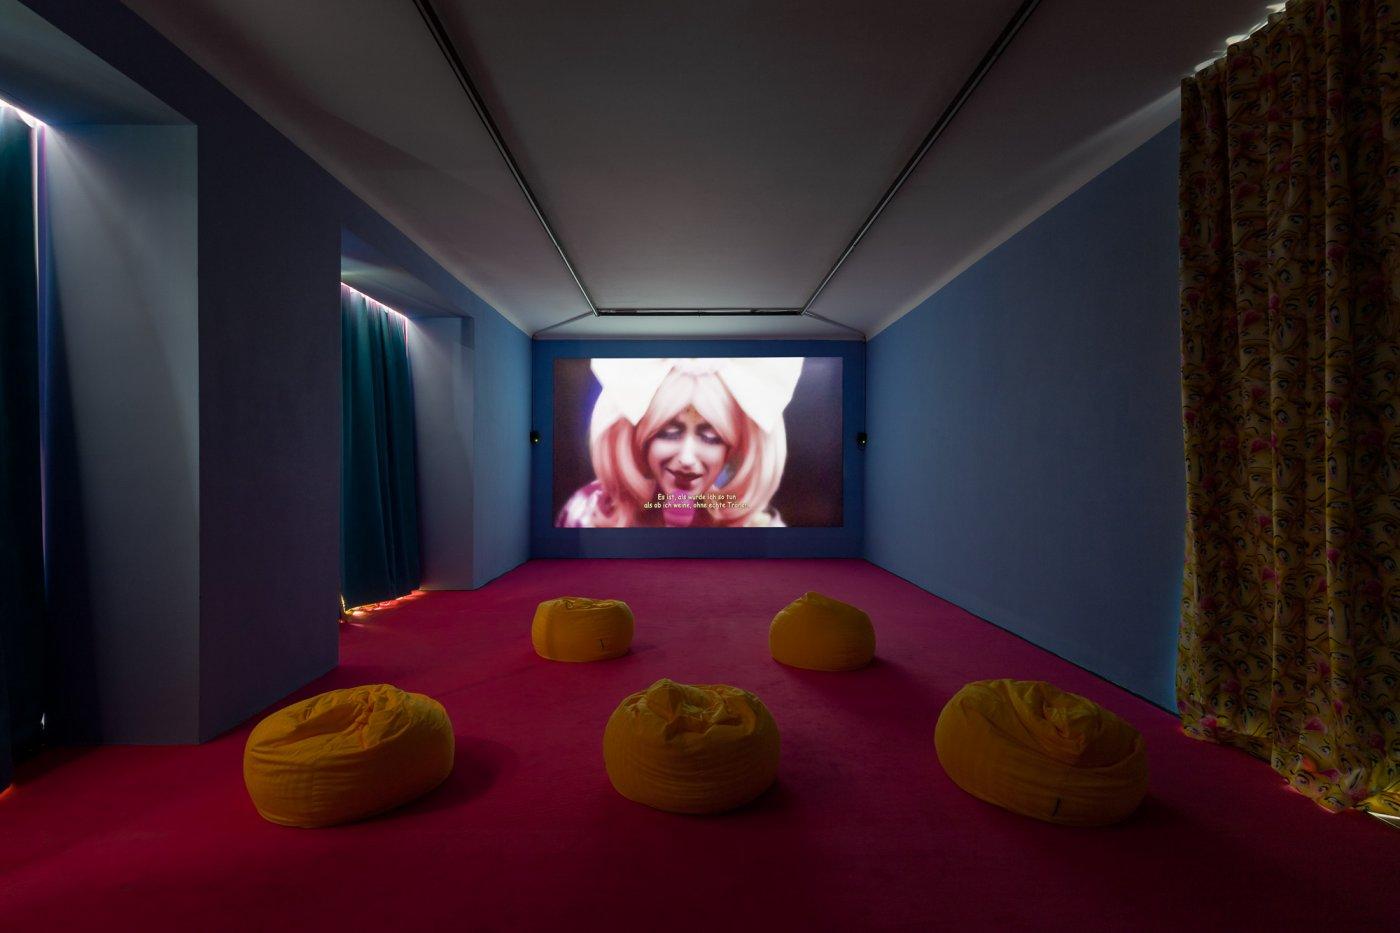 Galerie Kandlhofer Rachel Maclean new 6